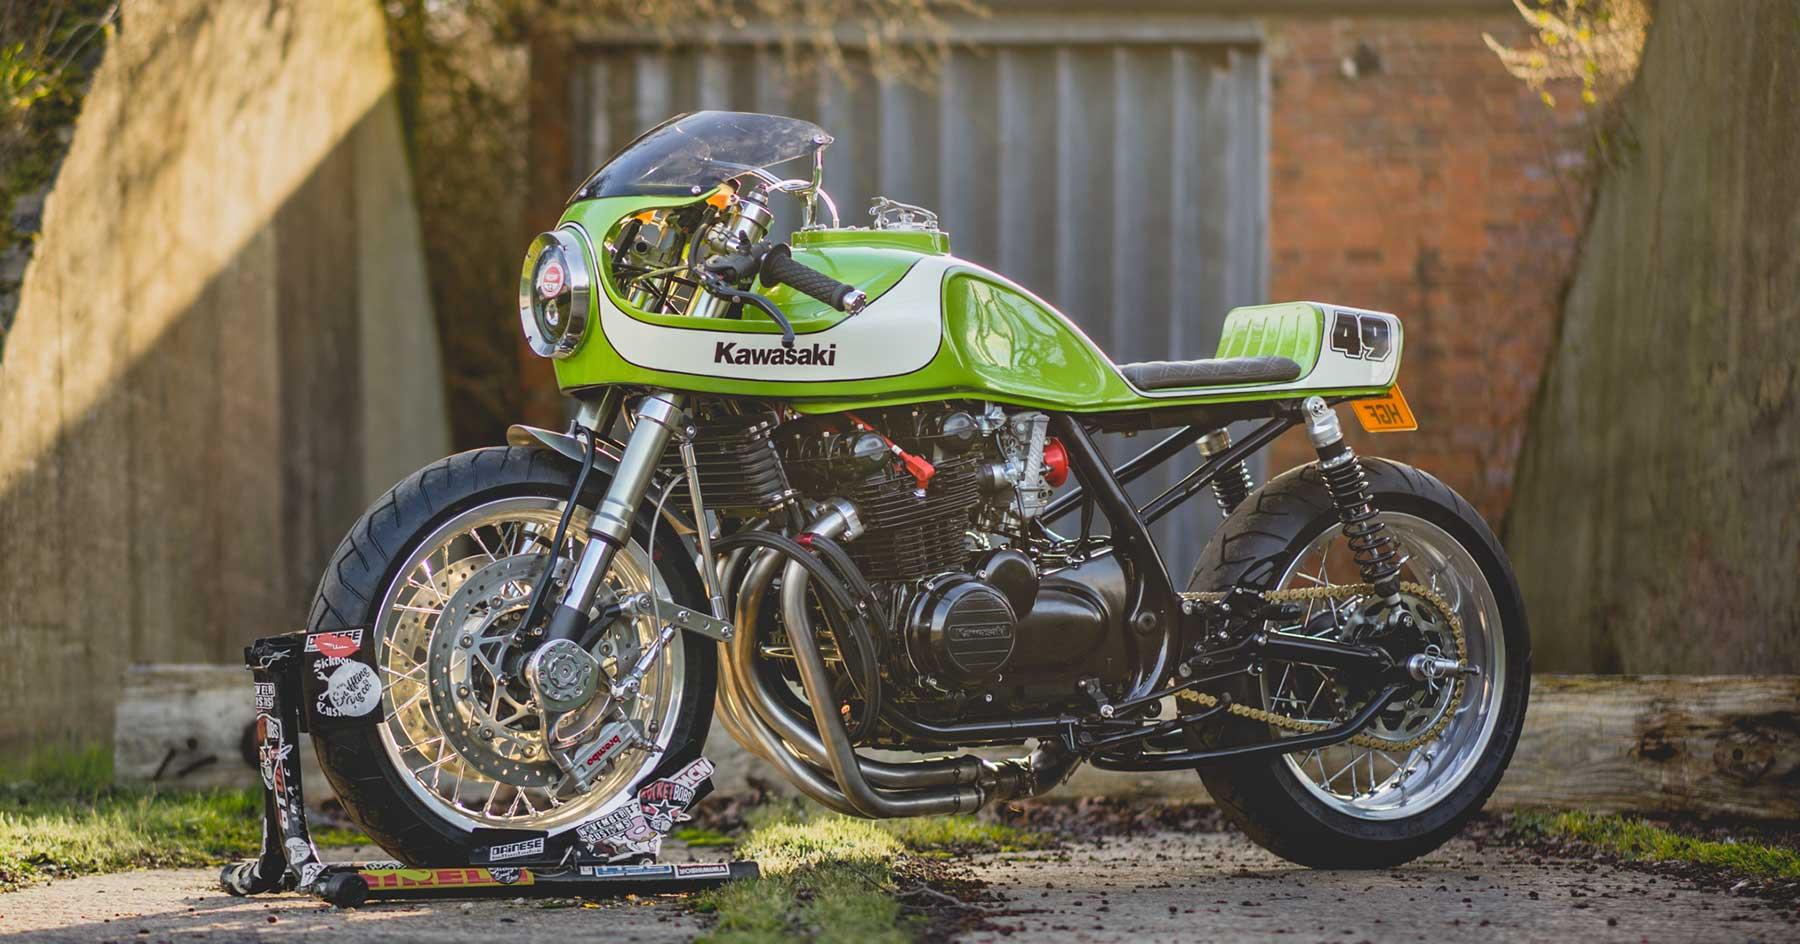 The Nineties are calling: November's Kawasaki Zephyr 750